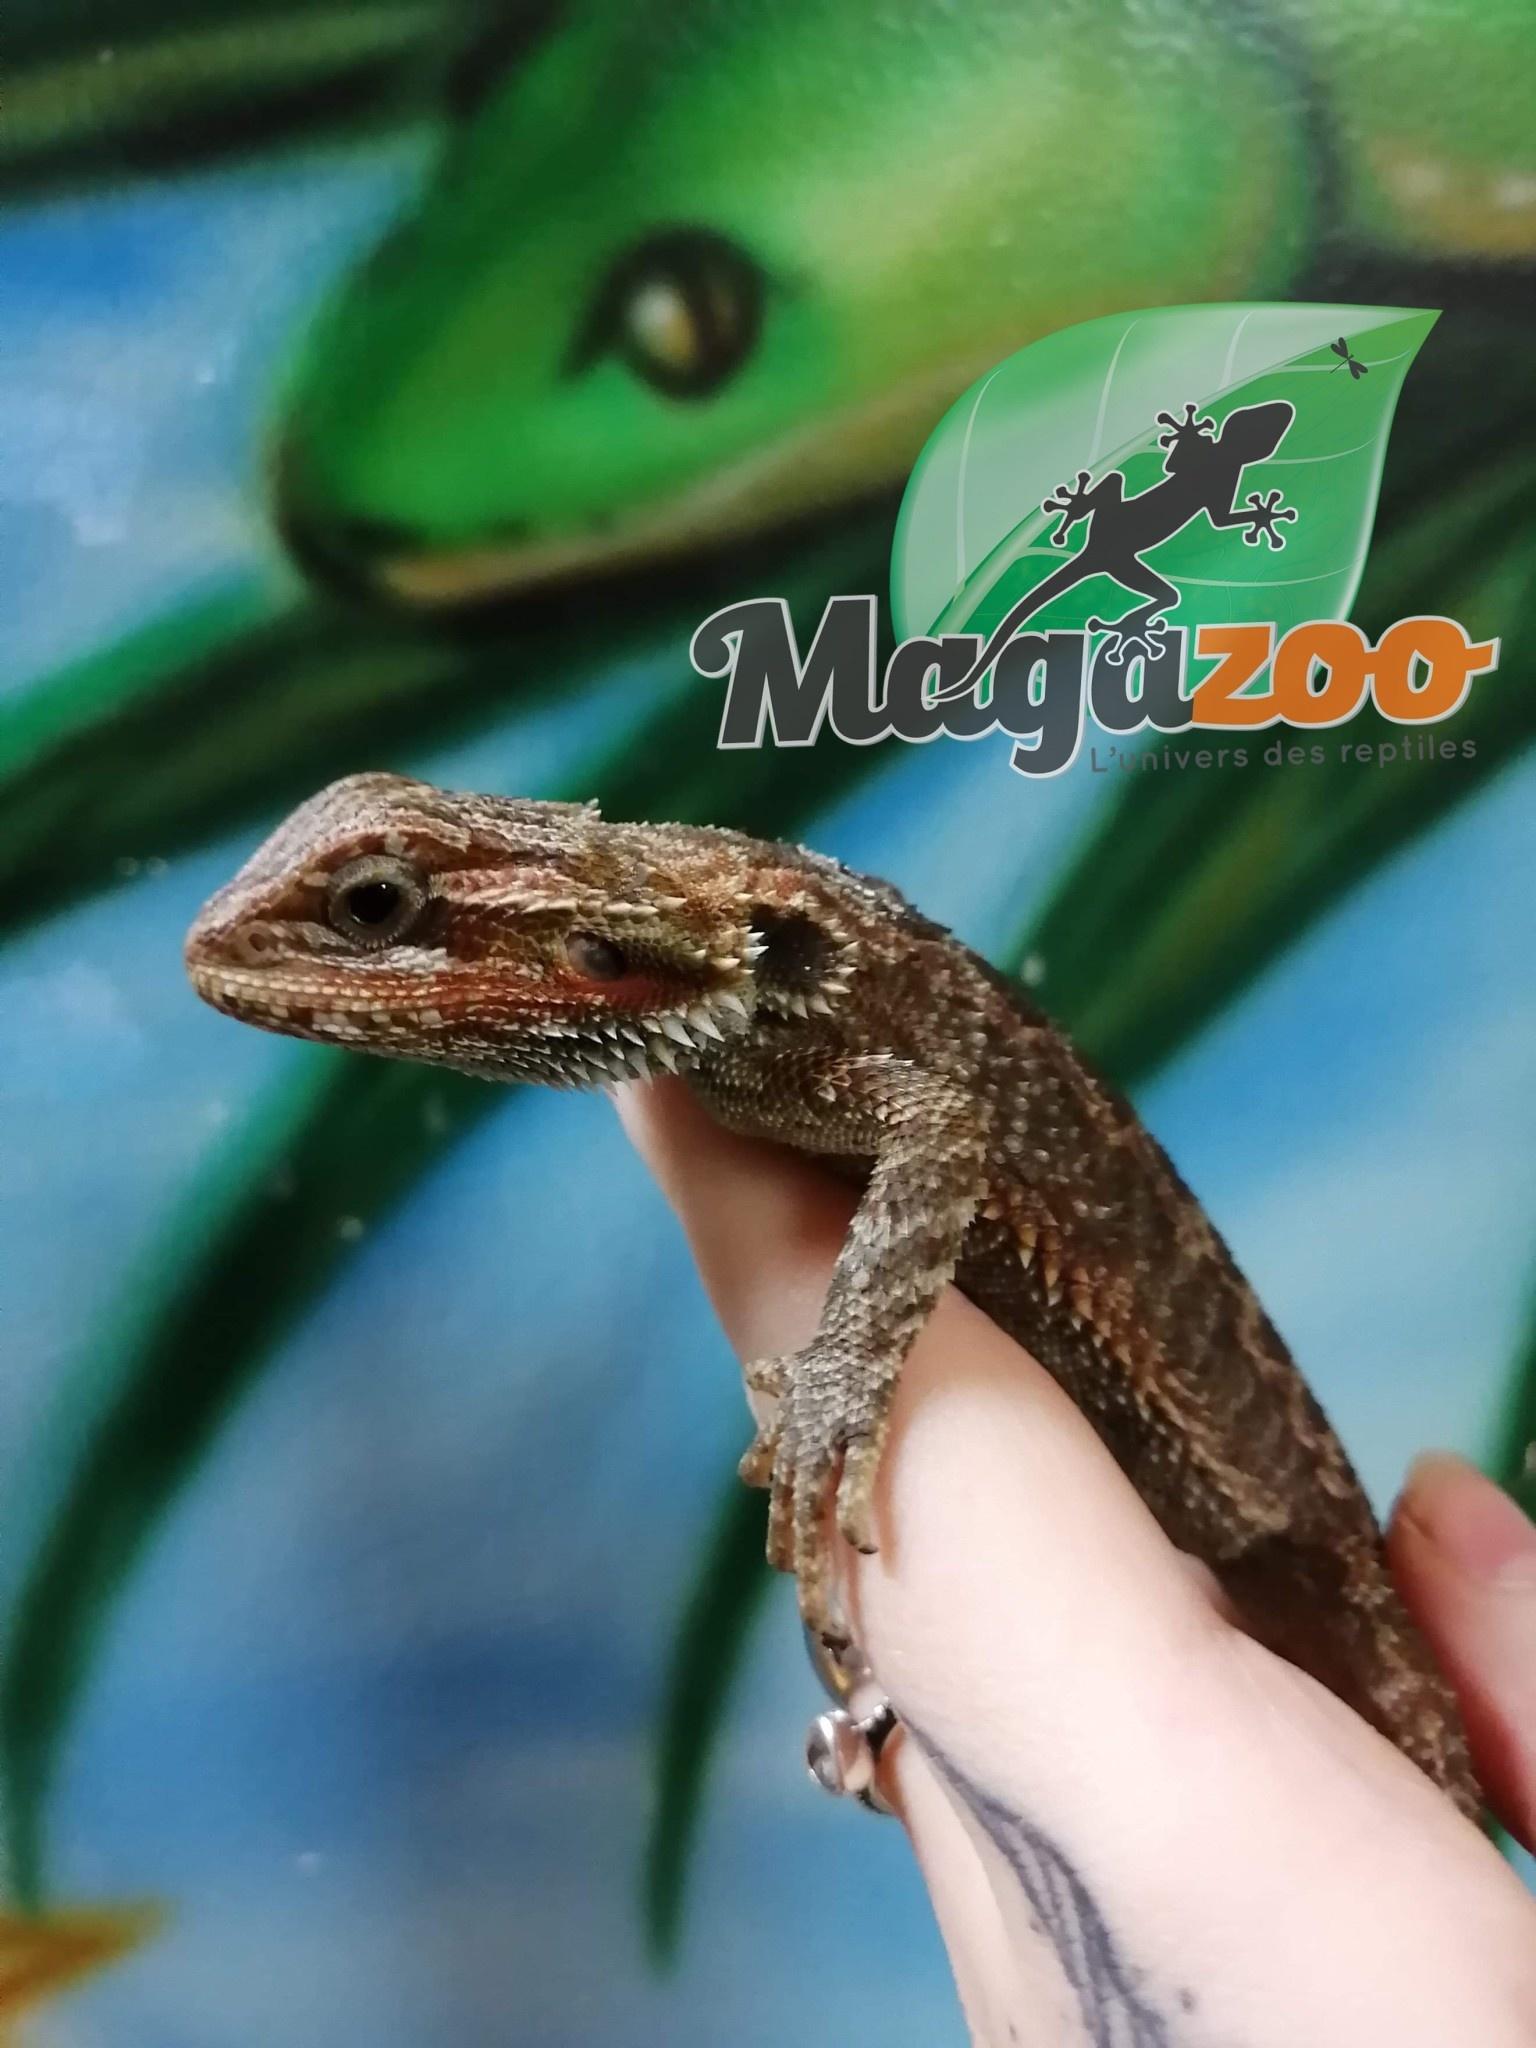 Magazoo Dragon barbu hypo translucide géant  femelle